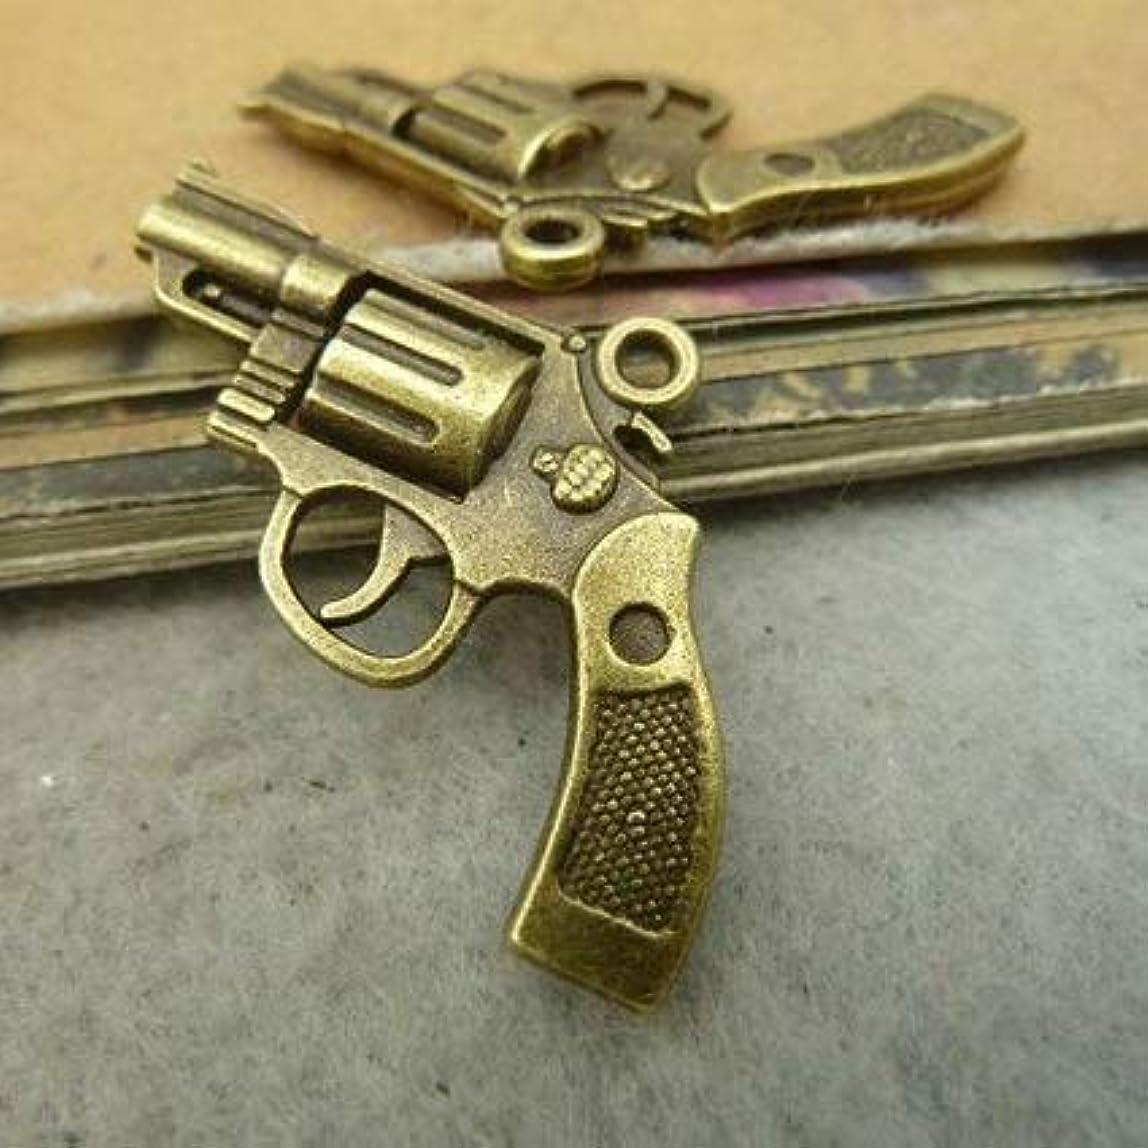 6 Bronze Gun Charms Silver Tone Pistol Hand Gun Charms 29x22mm (CB204) cnvnpfo128282